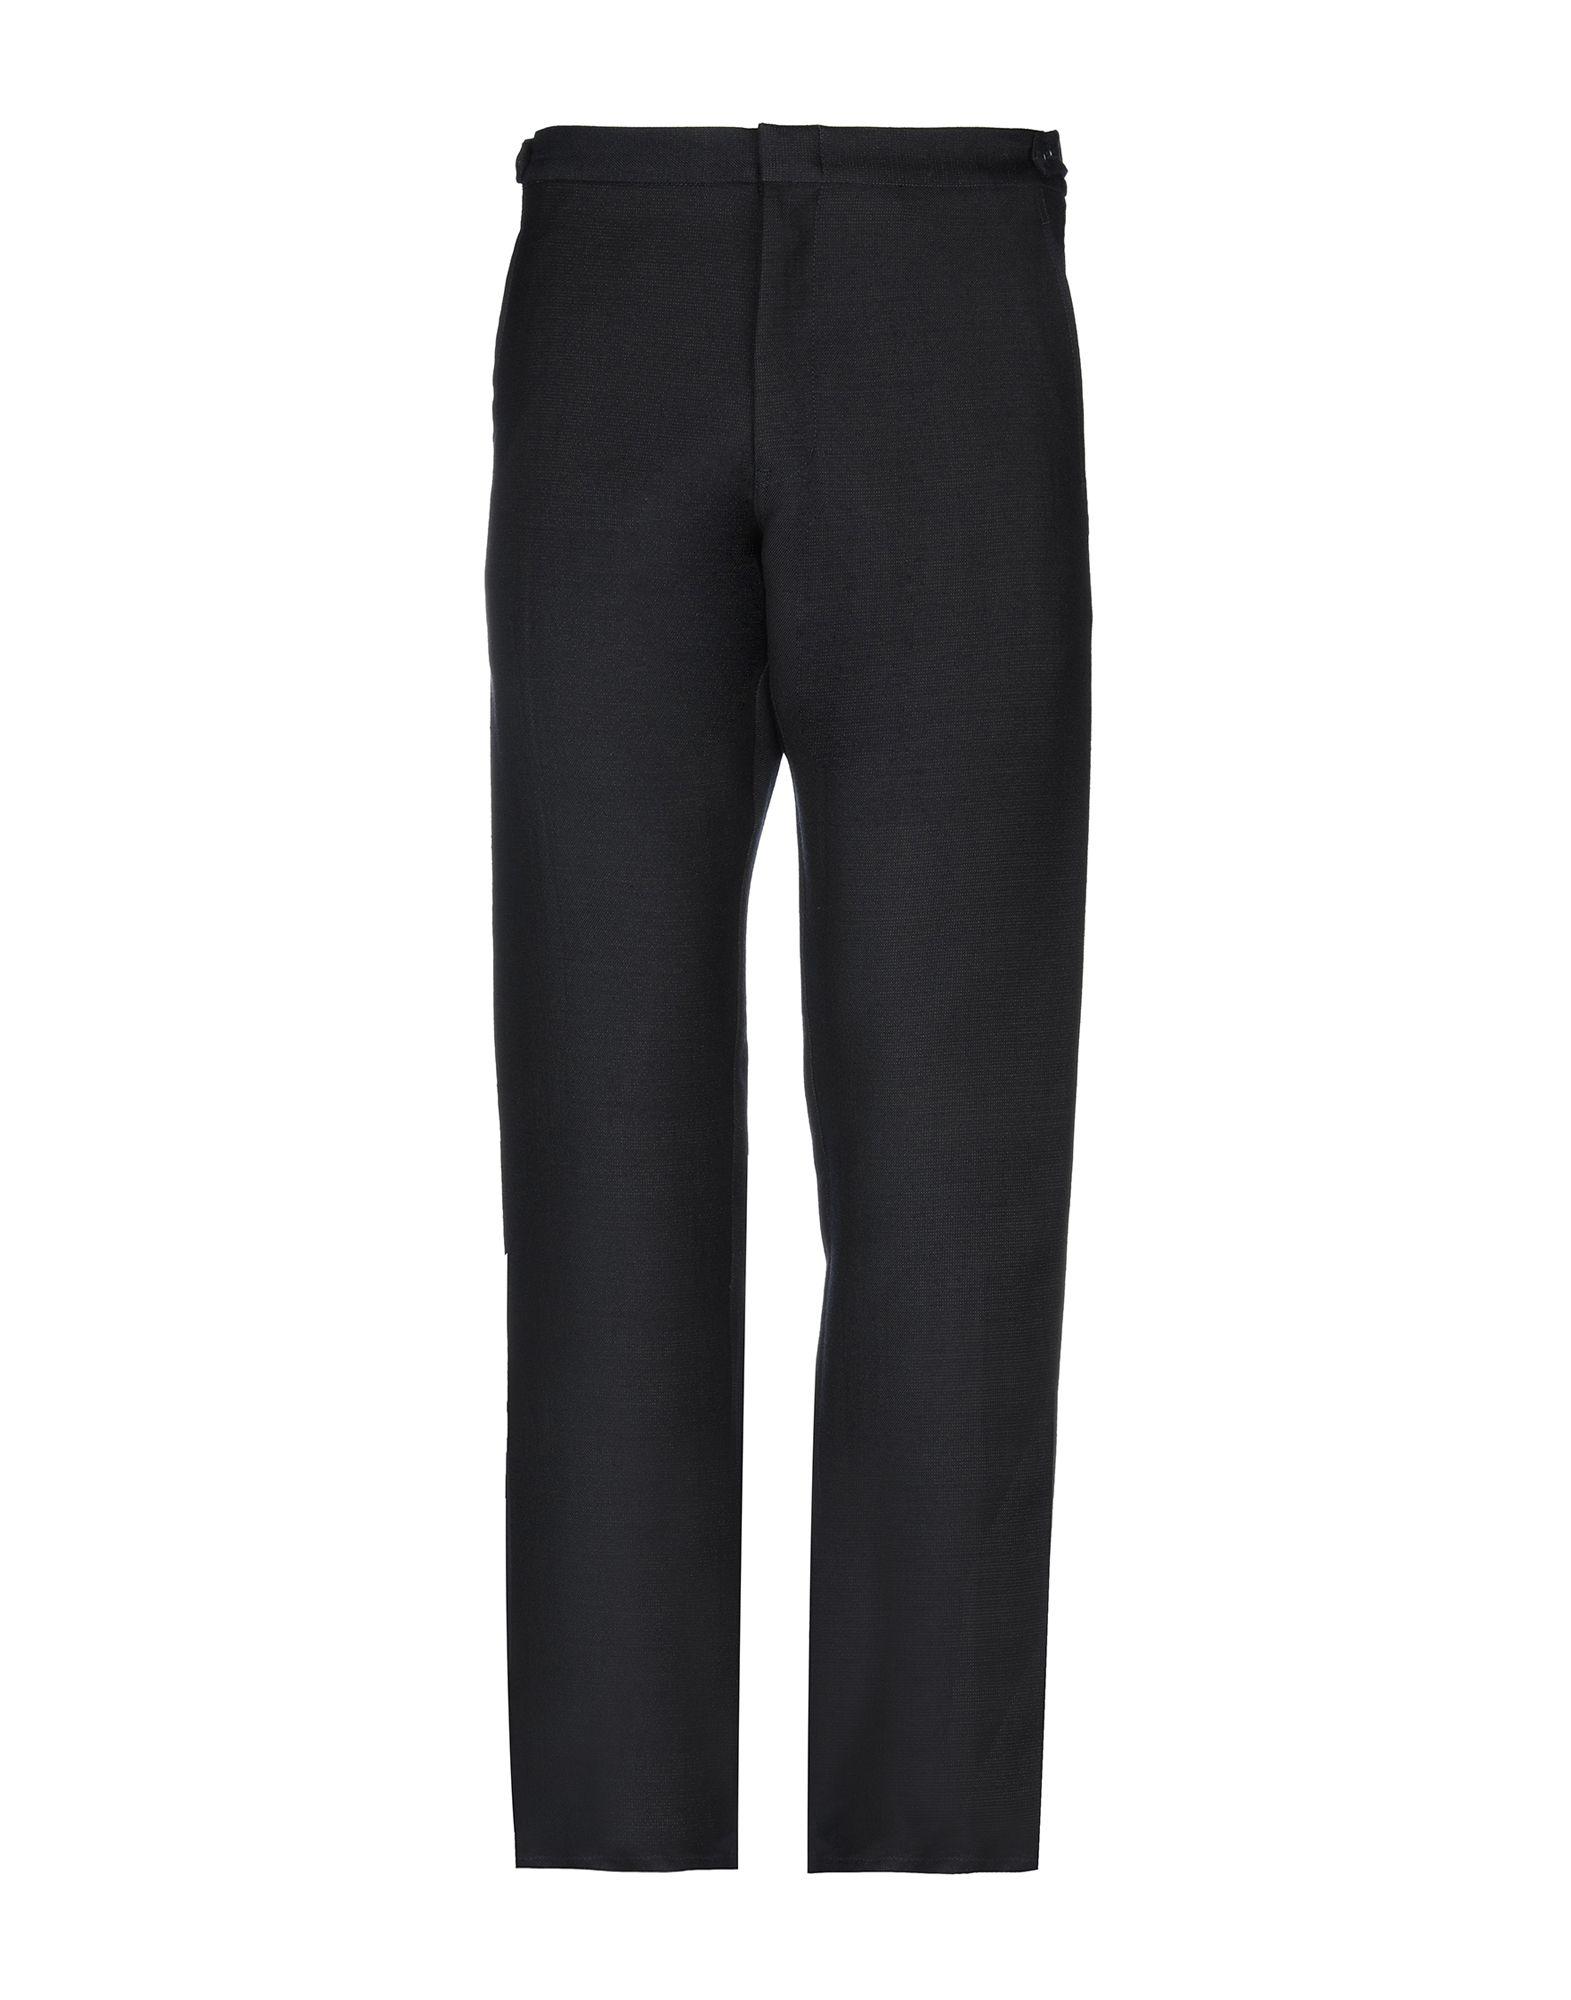 COMME des GARÇONS HOMME PLUS Повседневные брюки comme des garçons homme plus джинсовая верхняя одежда